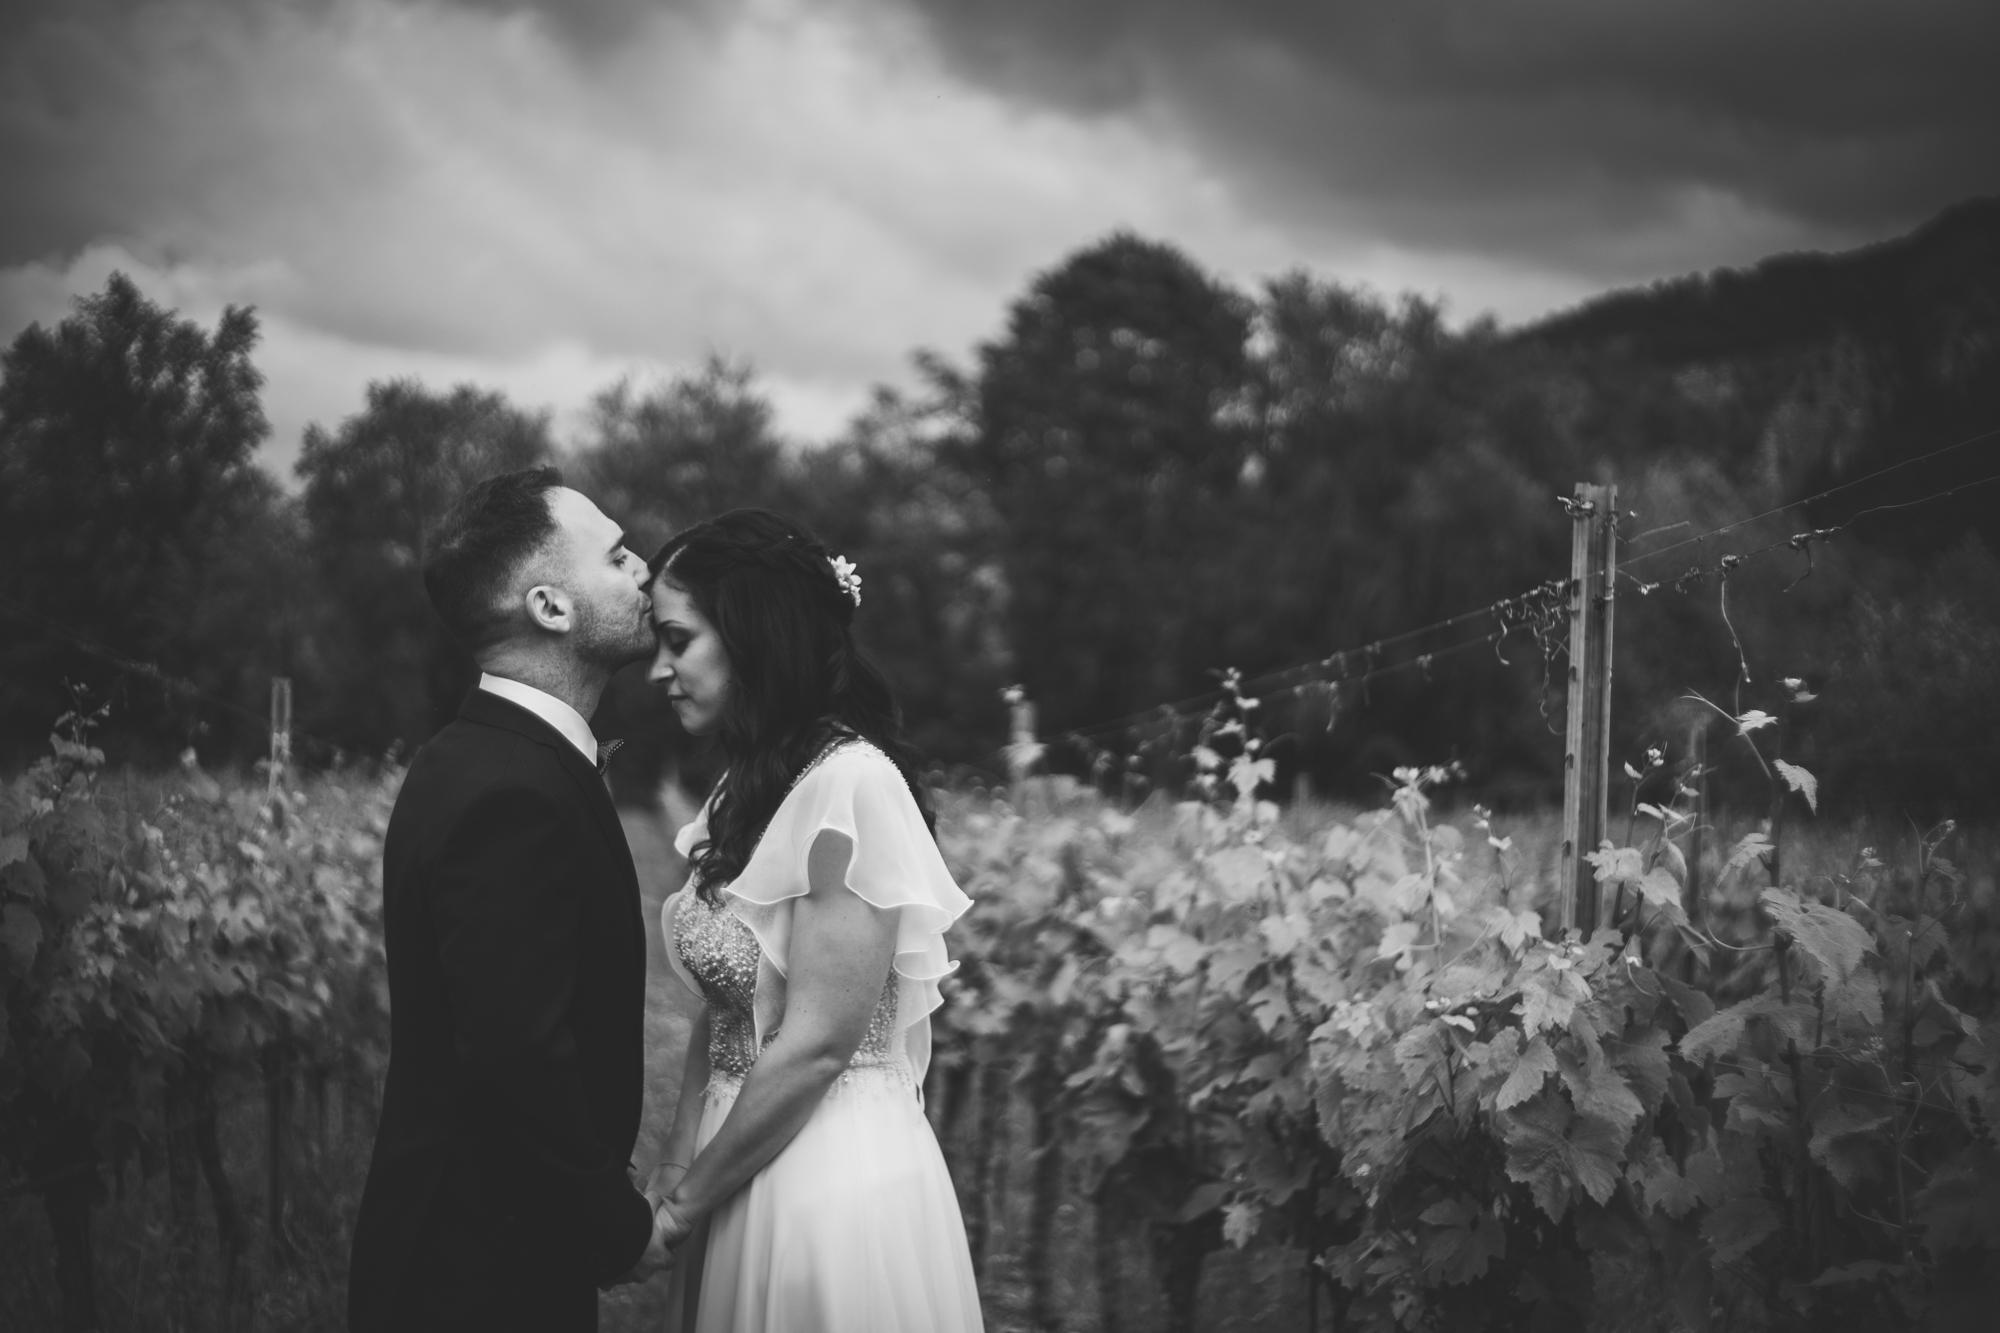 Fotografo matrimonio Brescia Federico Rongaroli